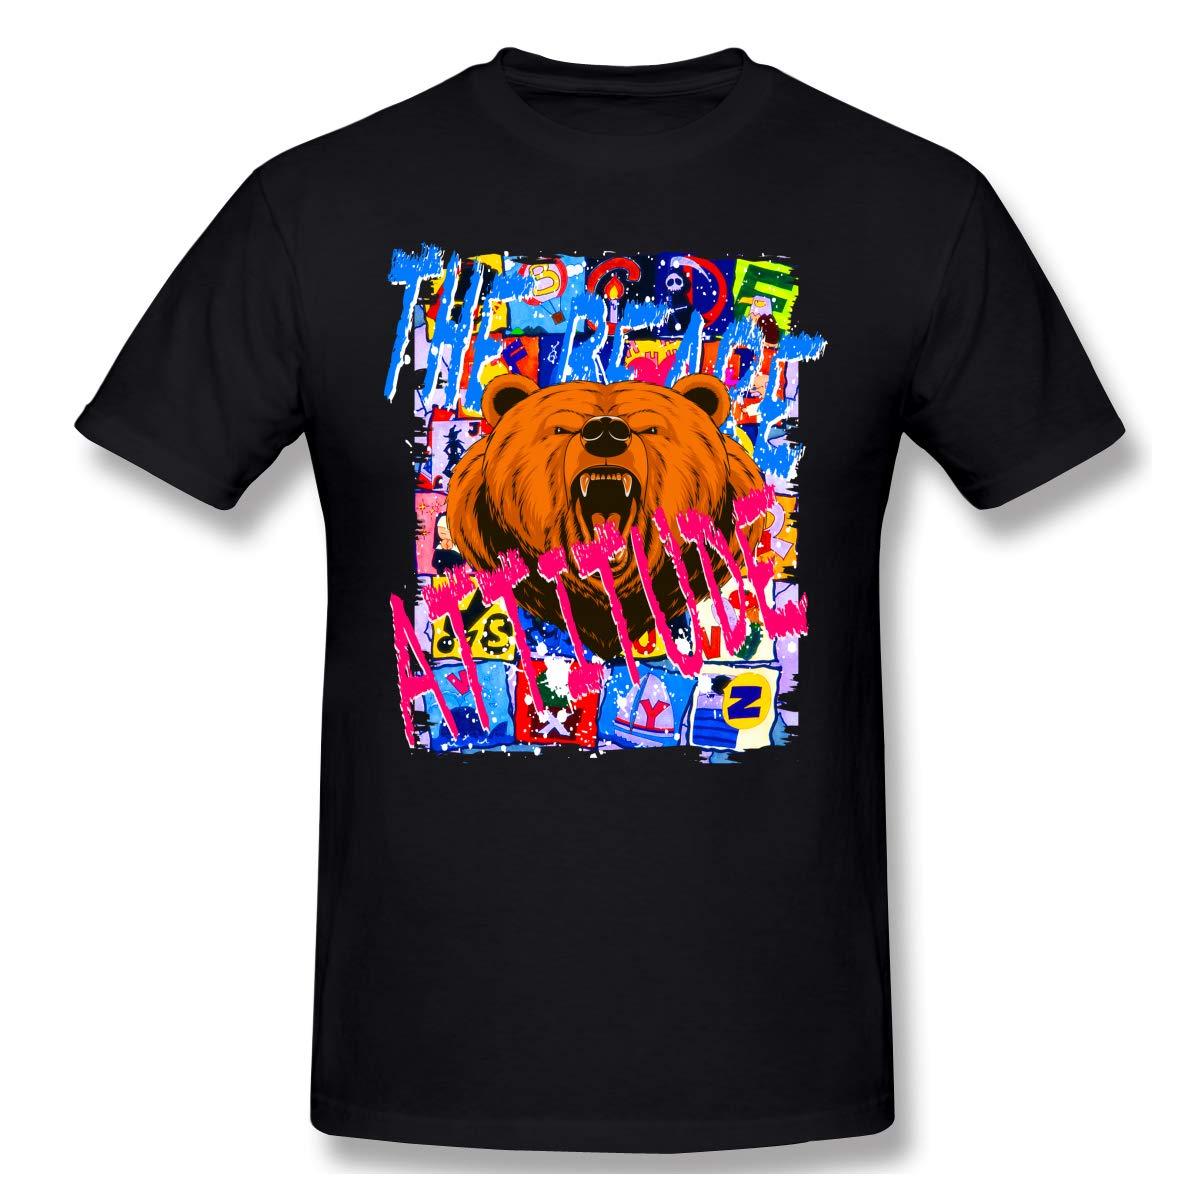 Xhsrgs S Bear Attitude Letter Howling California Bear Fashion Travel Black Short Sleeve T Shirts